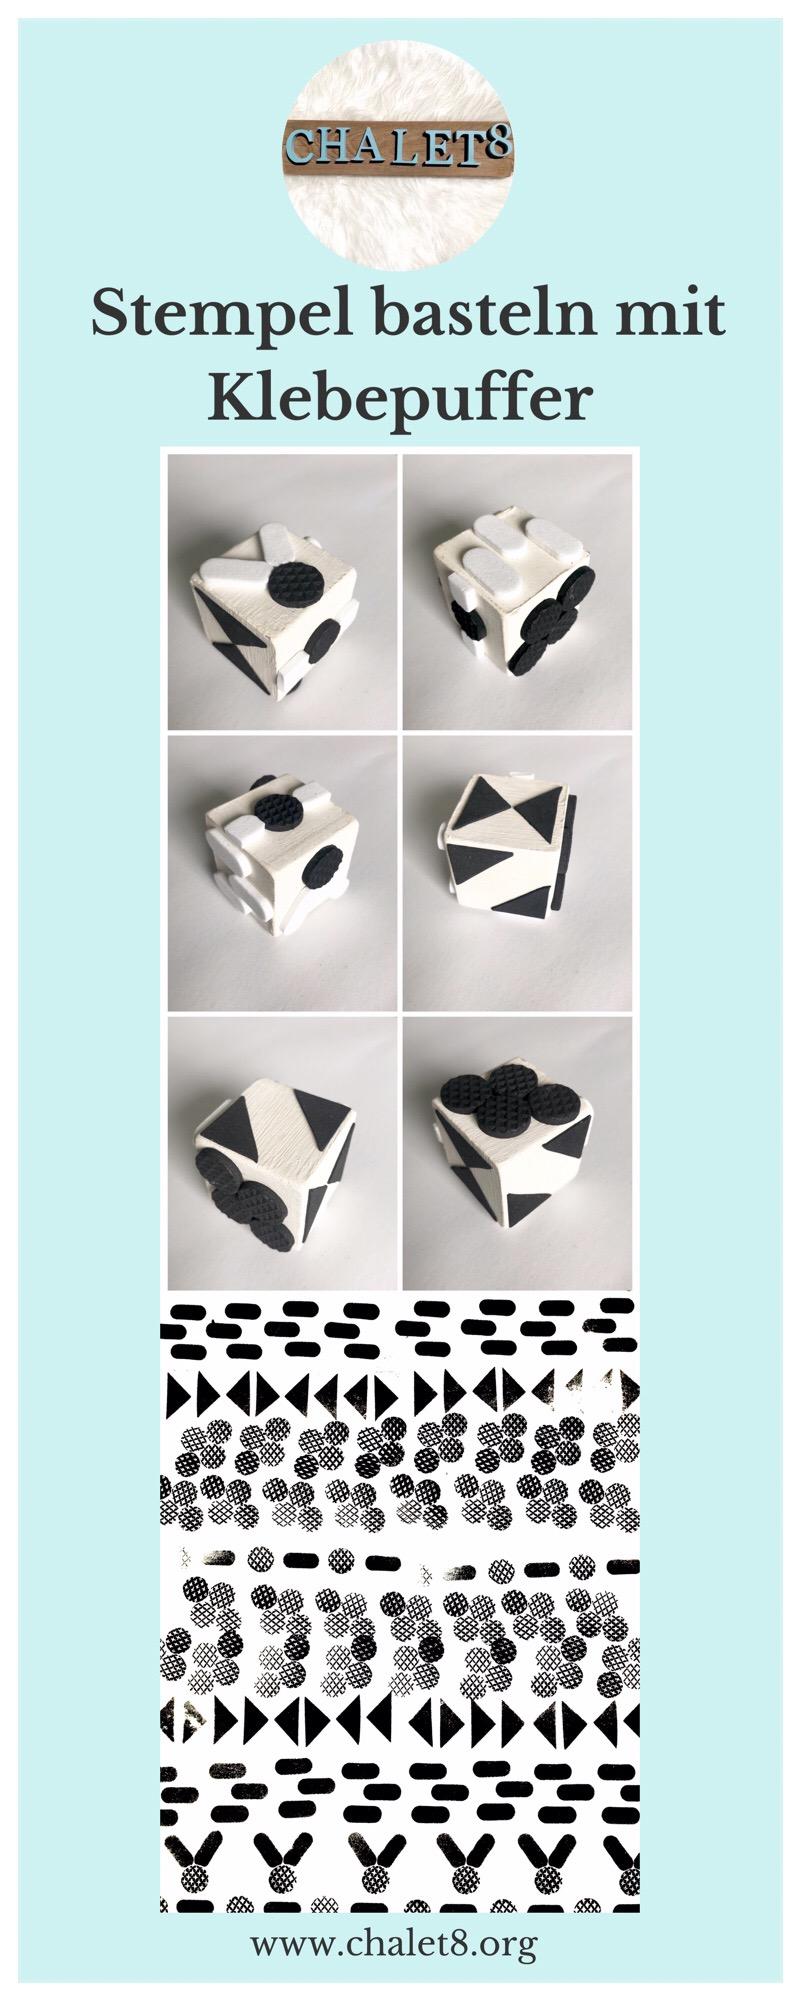 Stempel selber machen. Stempel erstellen. DIY Stempel mit Klebepuffern basteln. #Chalet8 #Stempel